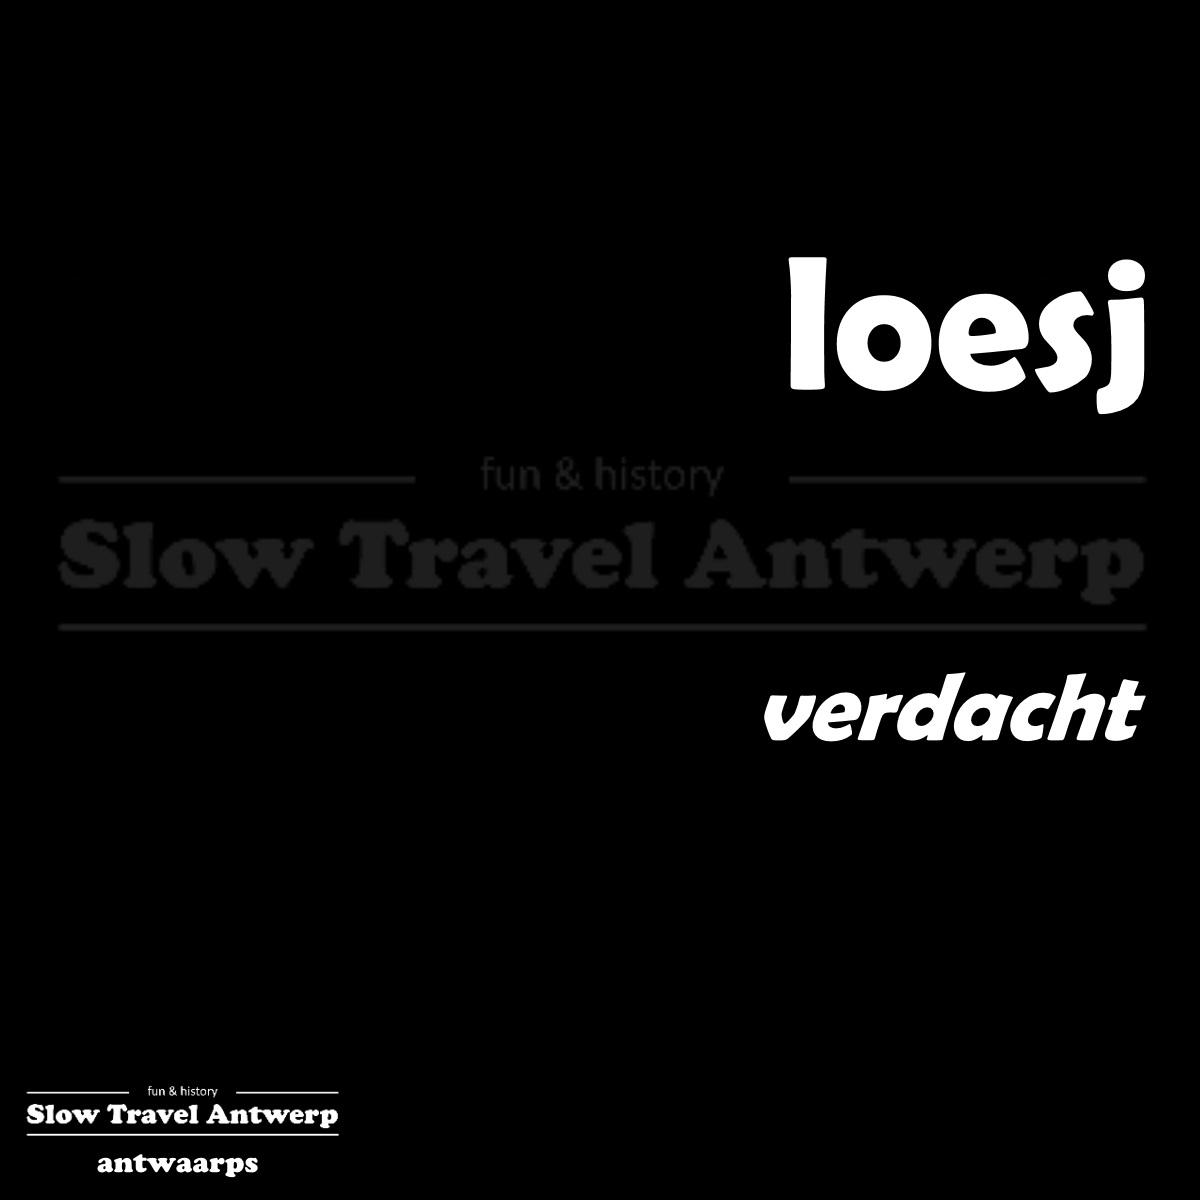 loesj – verdacht – supsicious